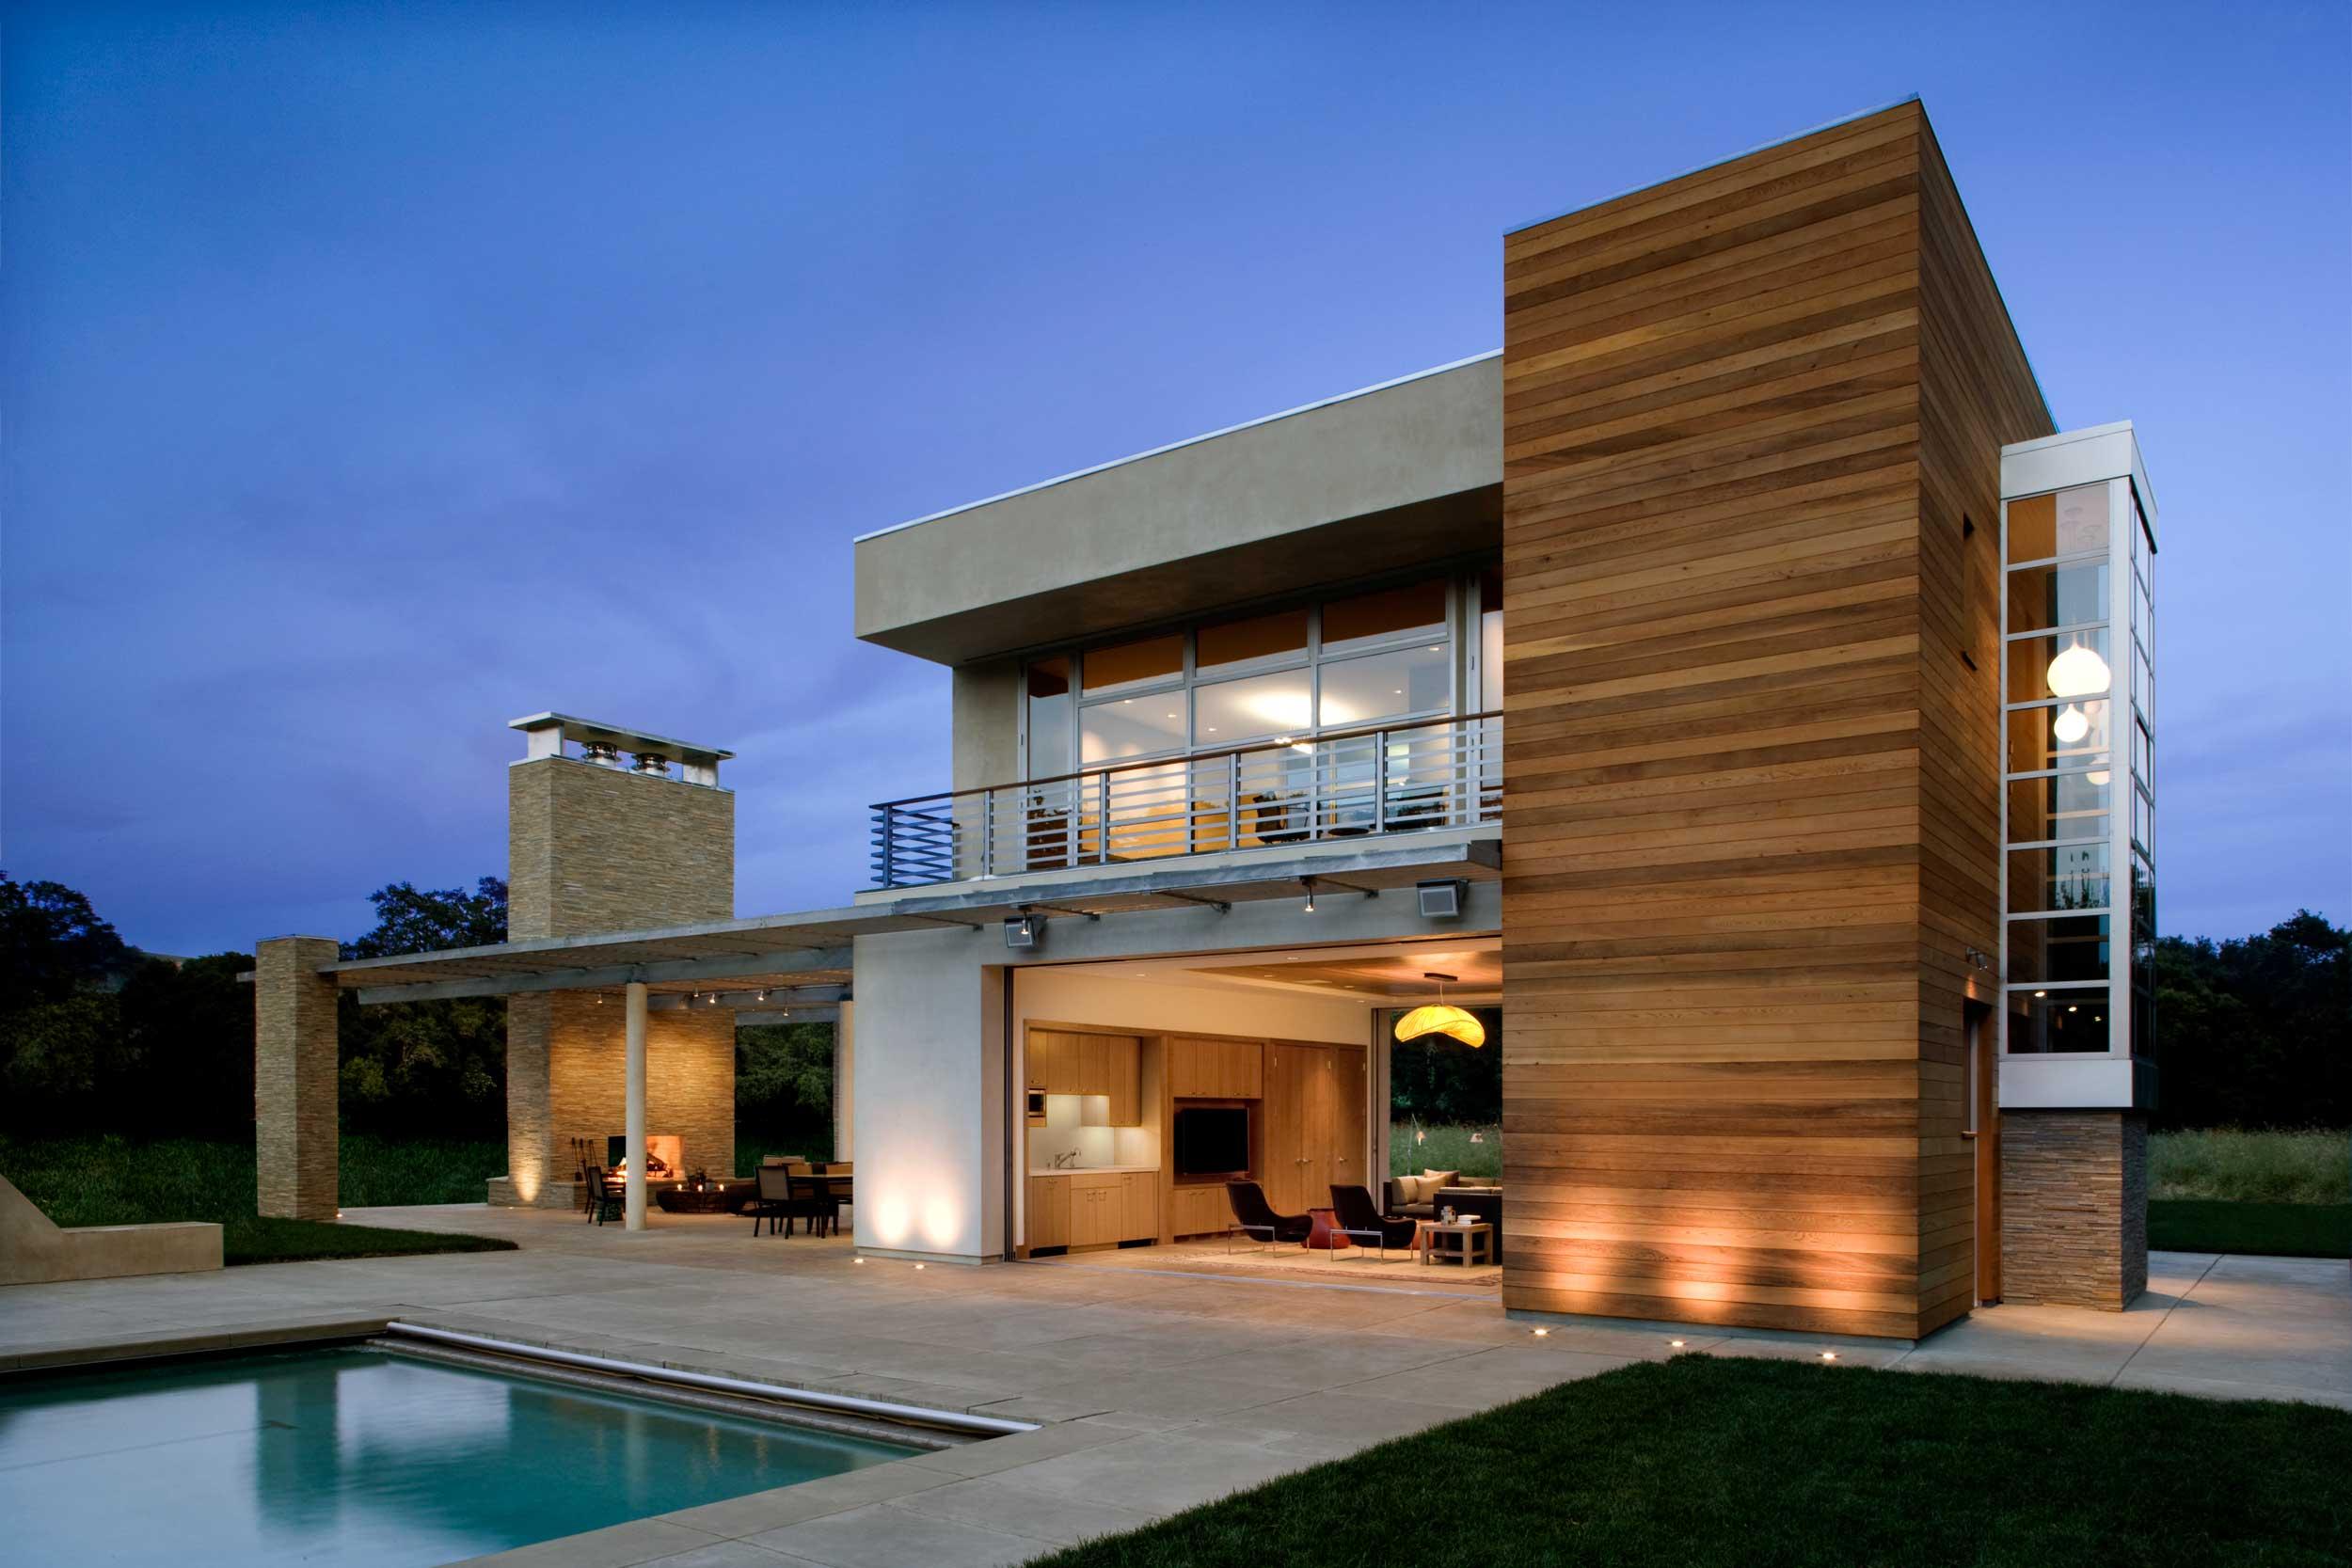 Sonoma Pool House